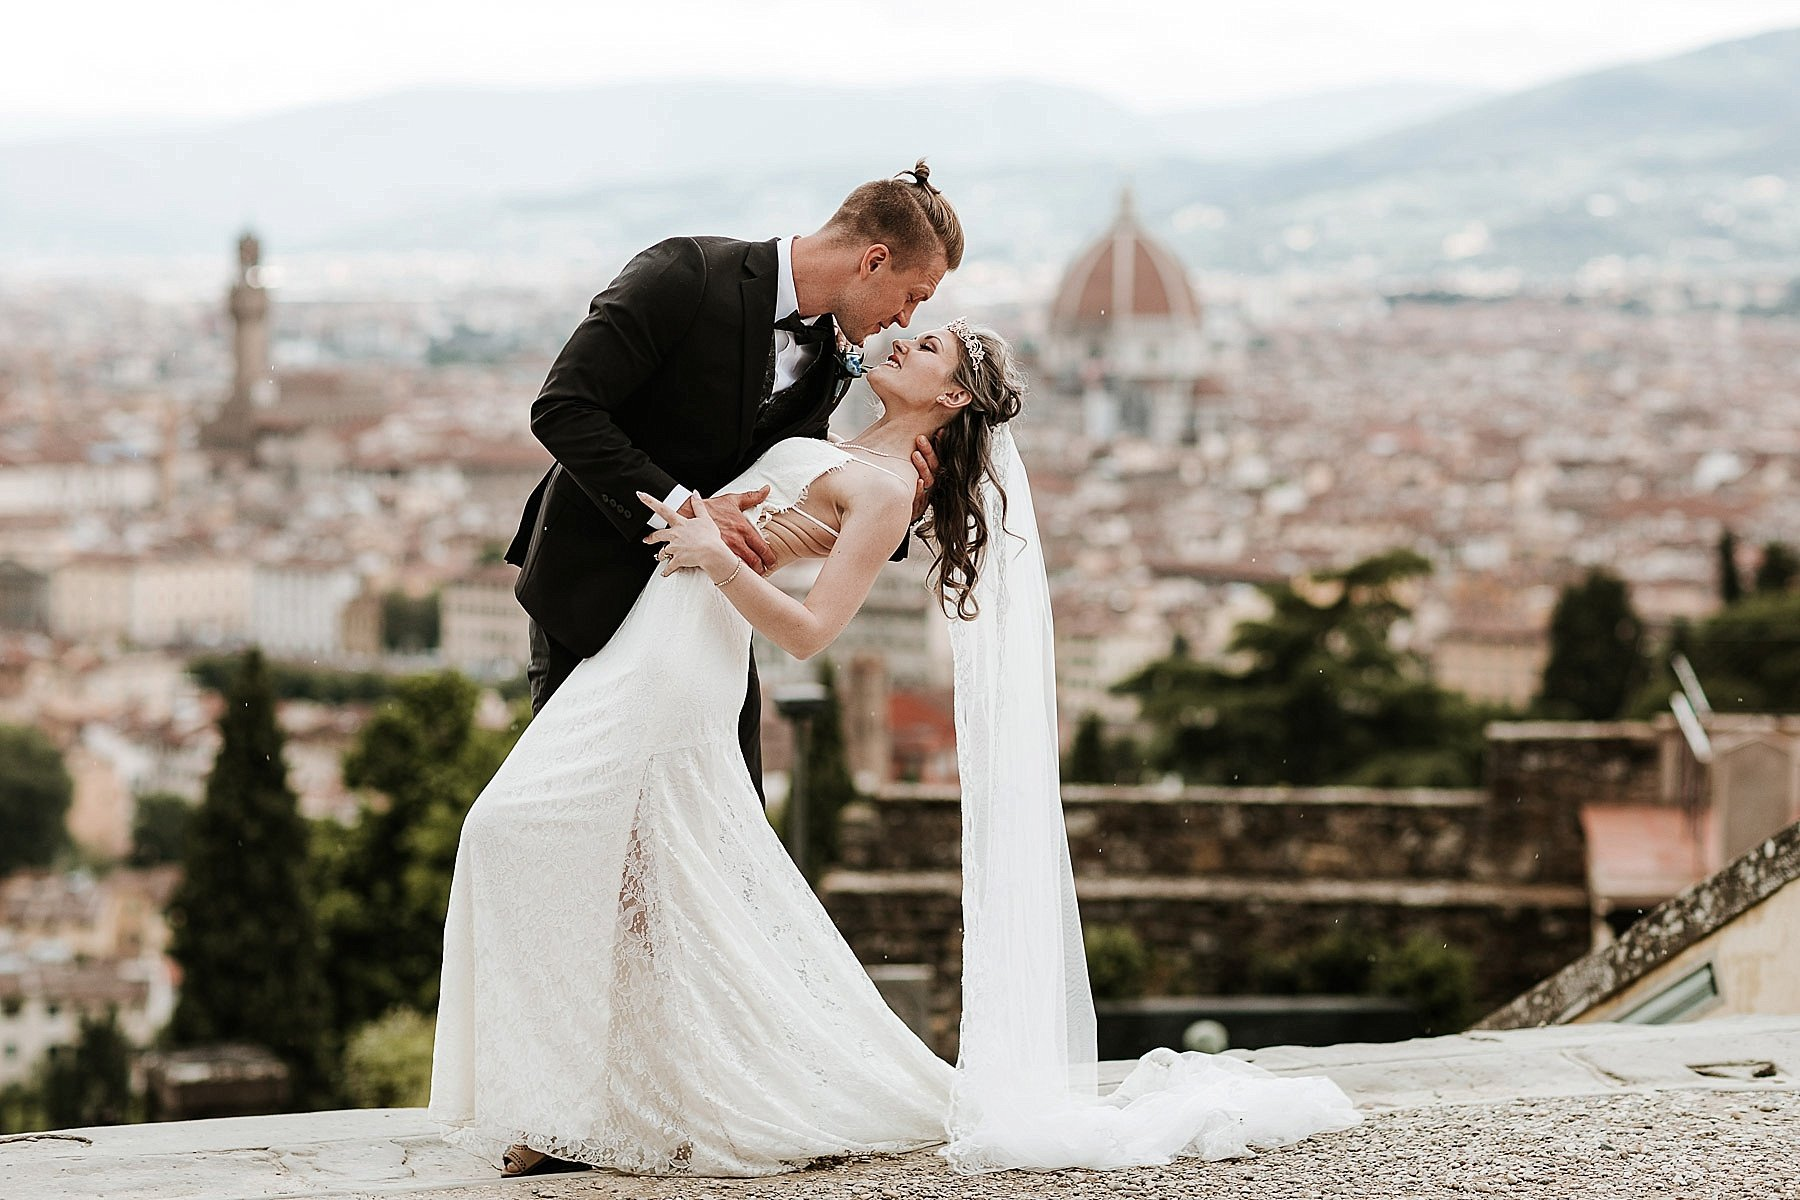 Bride and Groom picture in a fabulous scenario